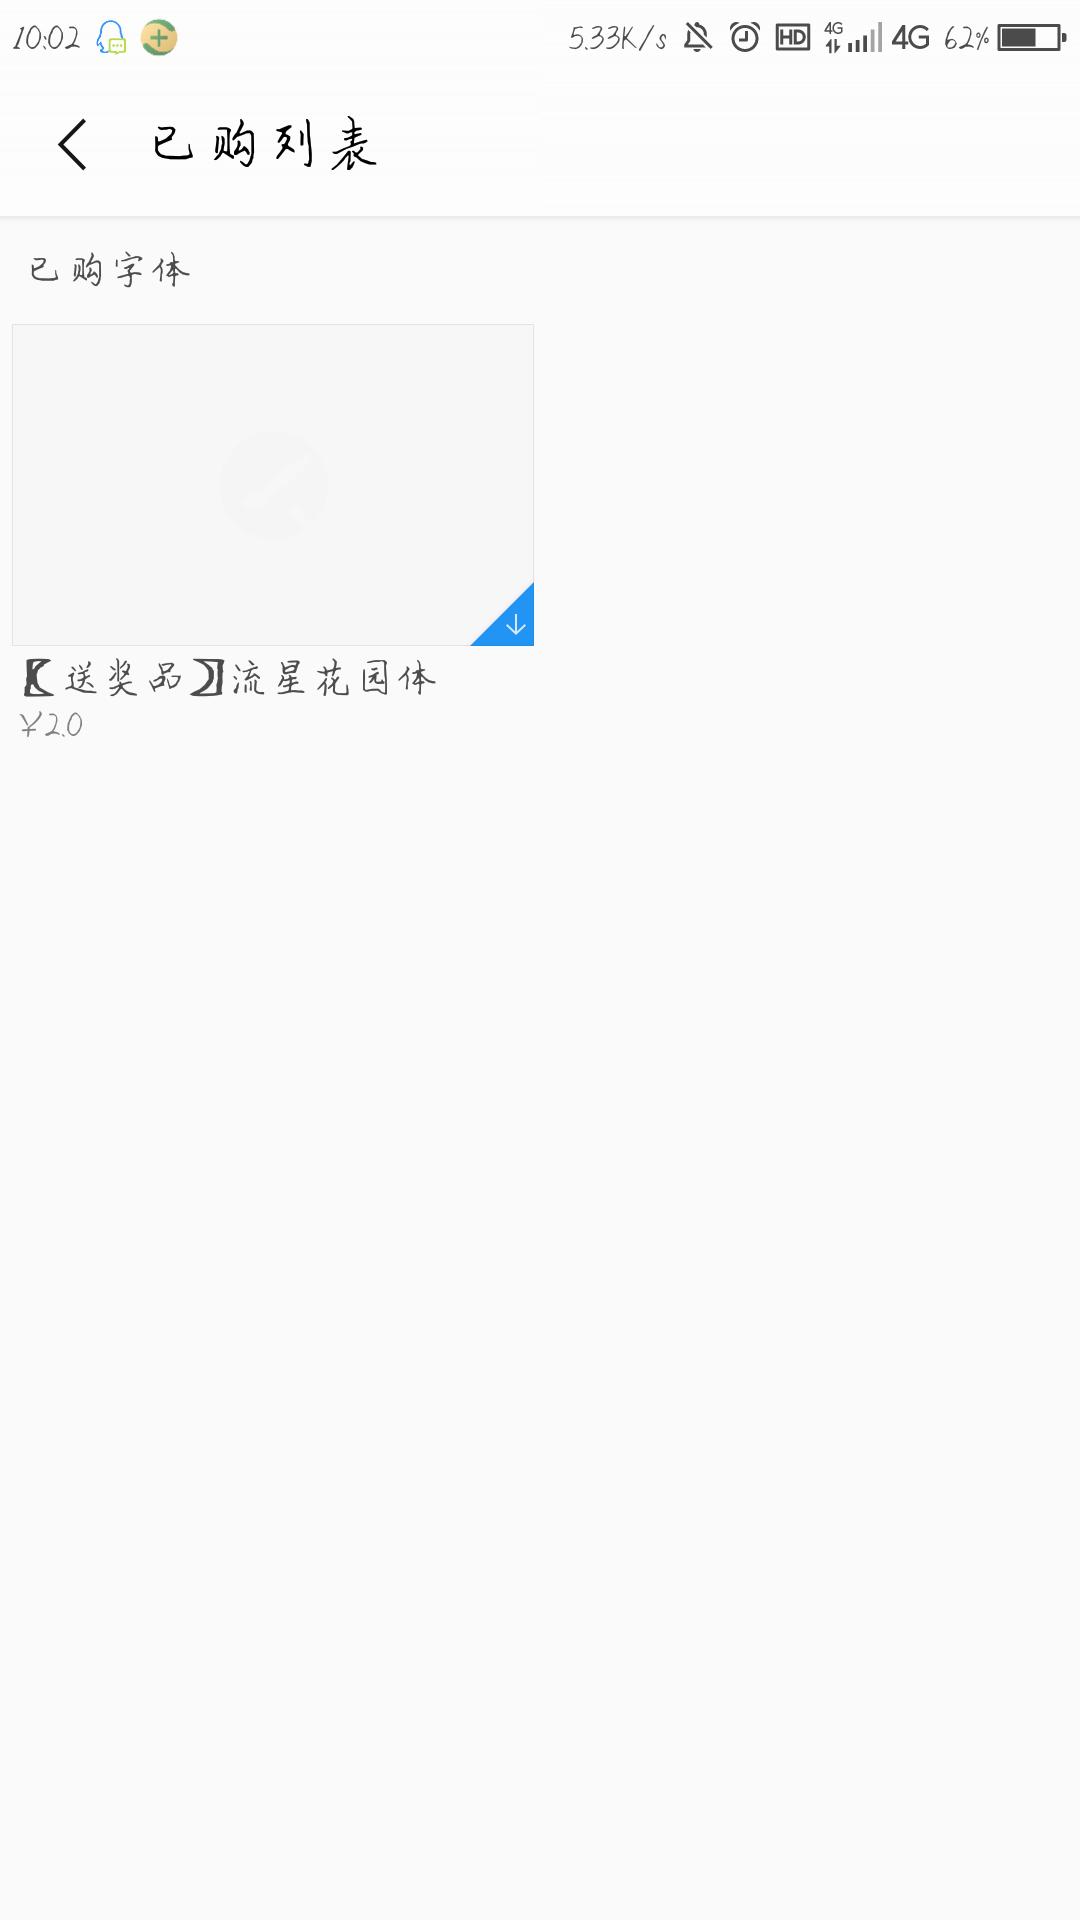 Screenshot_2016-12-27-10-02-48.png